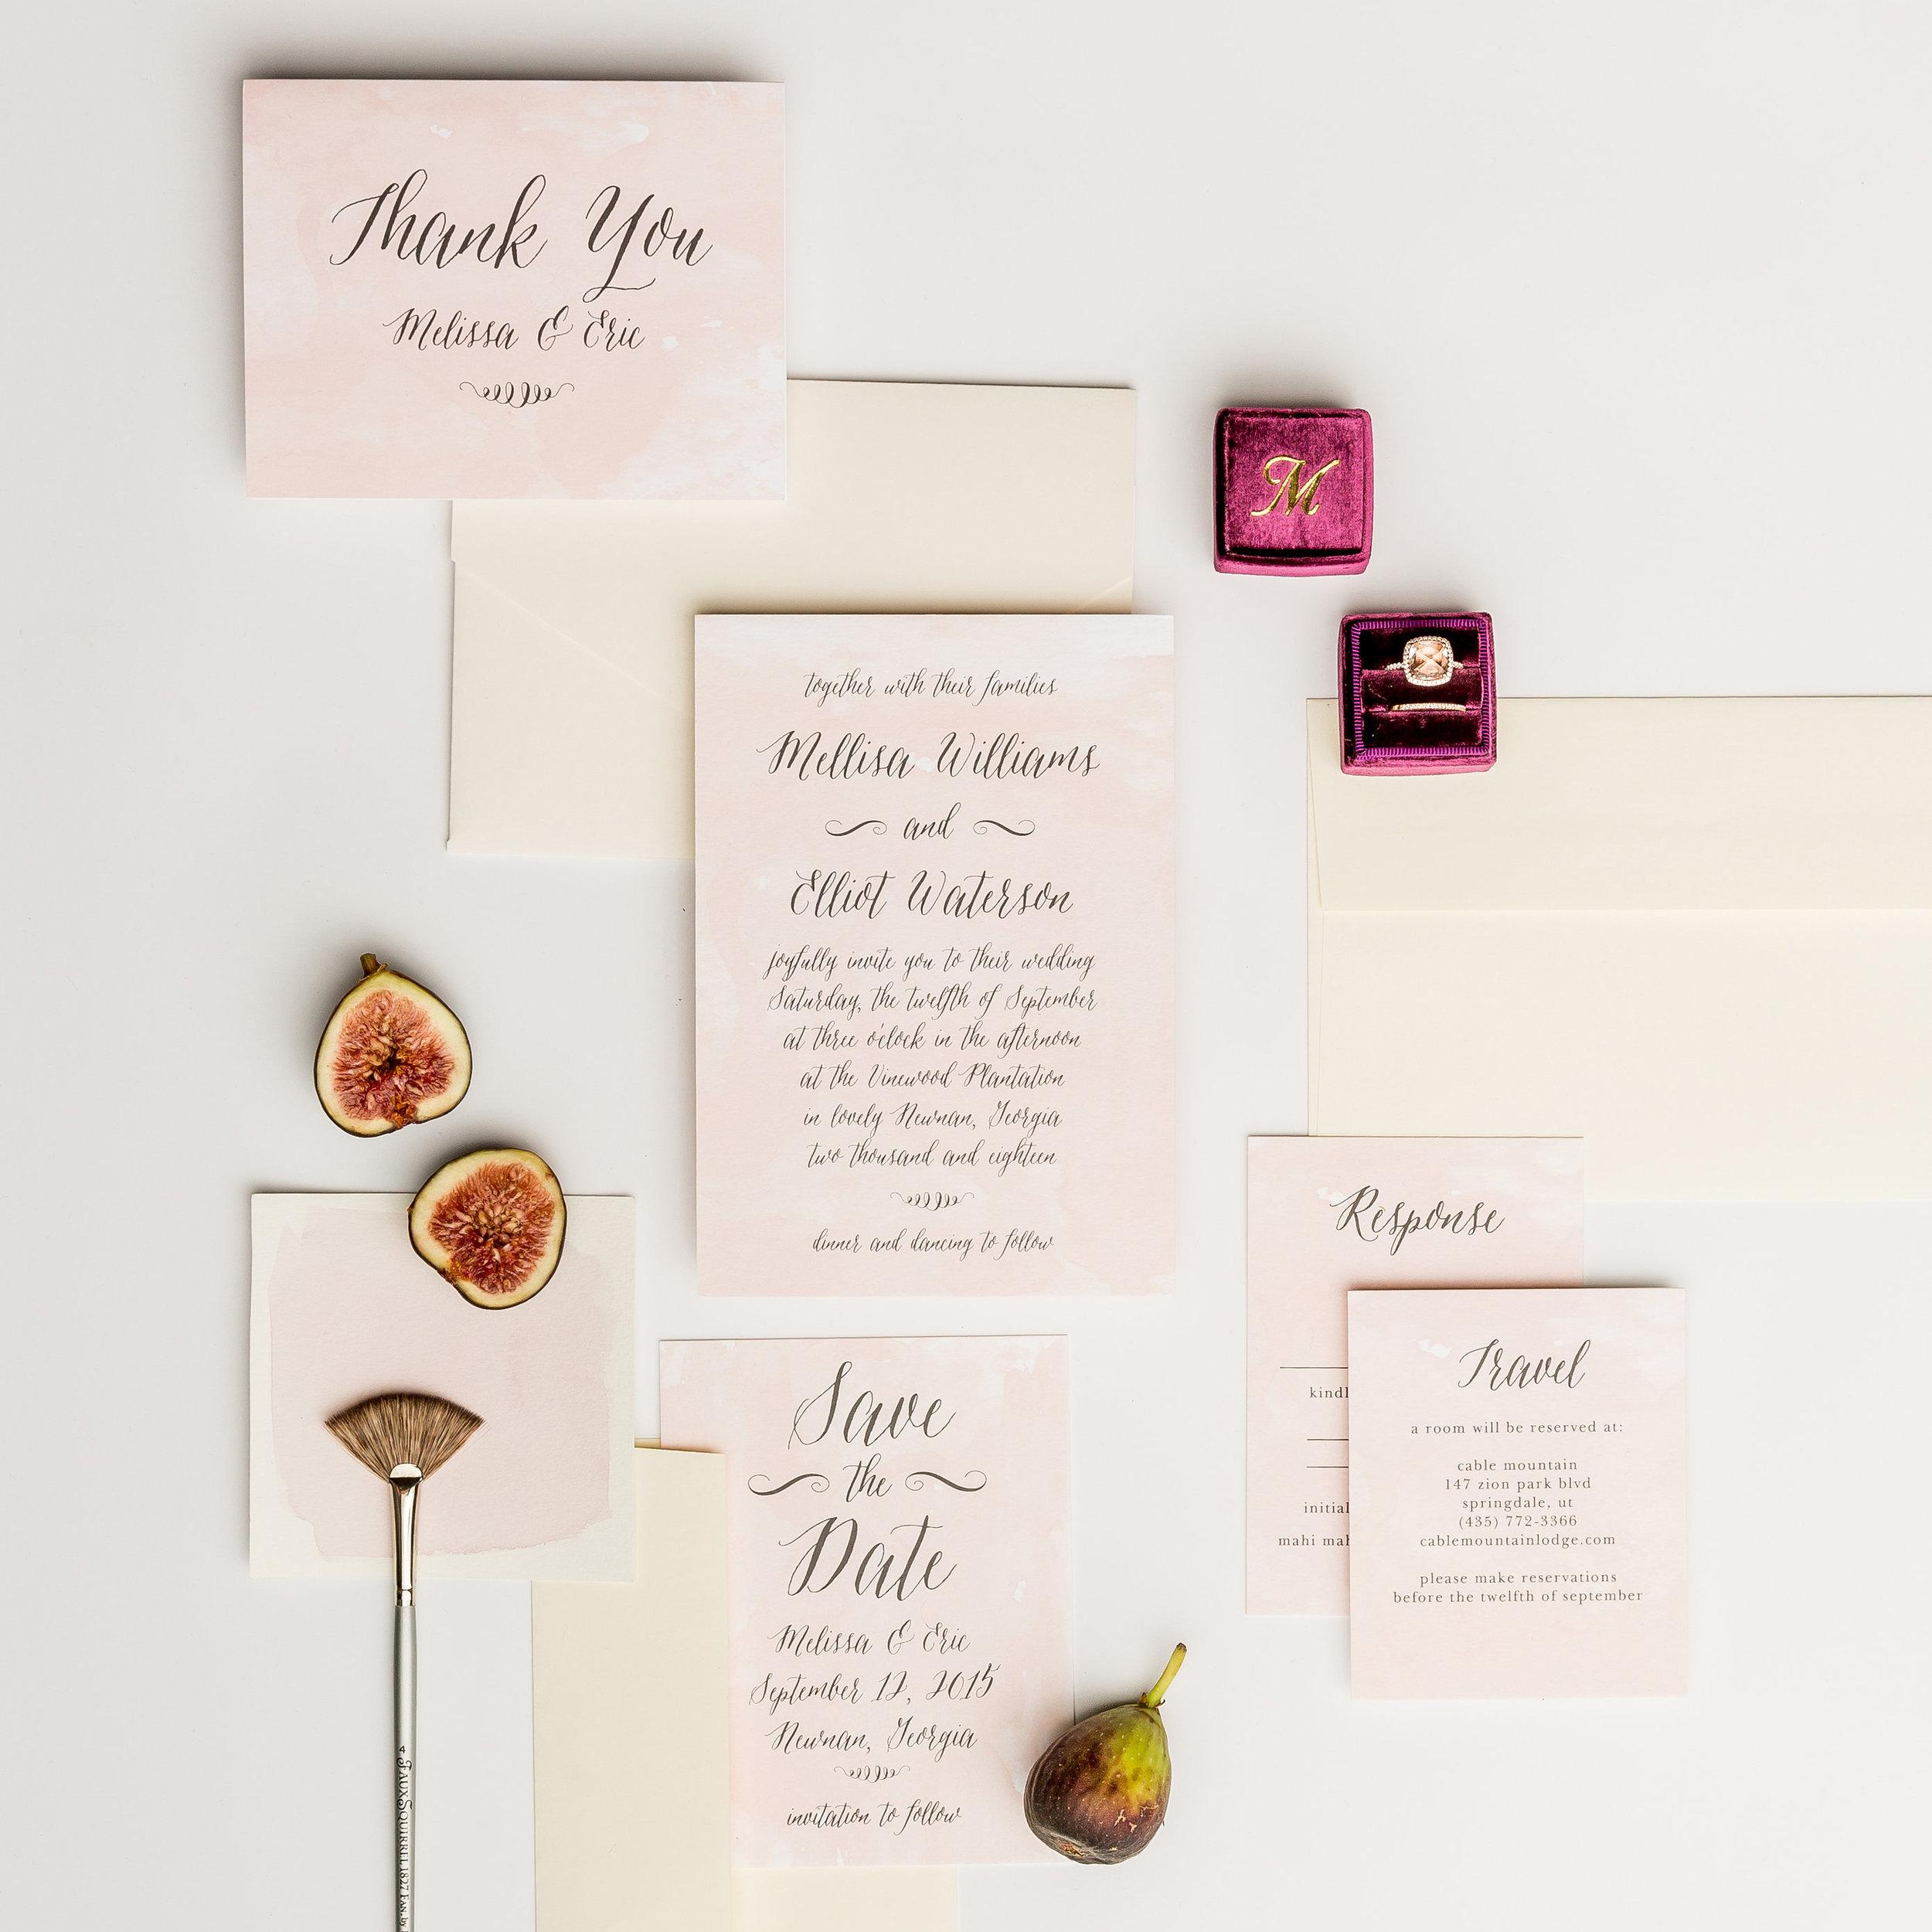 Basic_Invite_Wedding_Suites_26.jpg